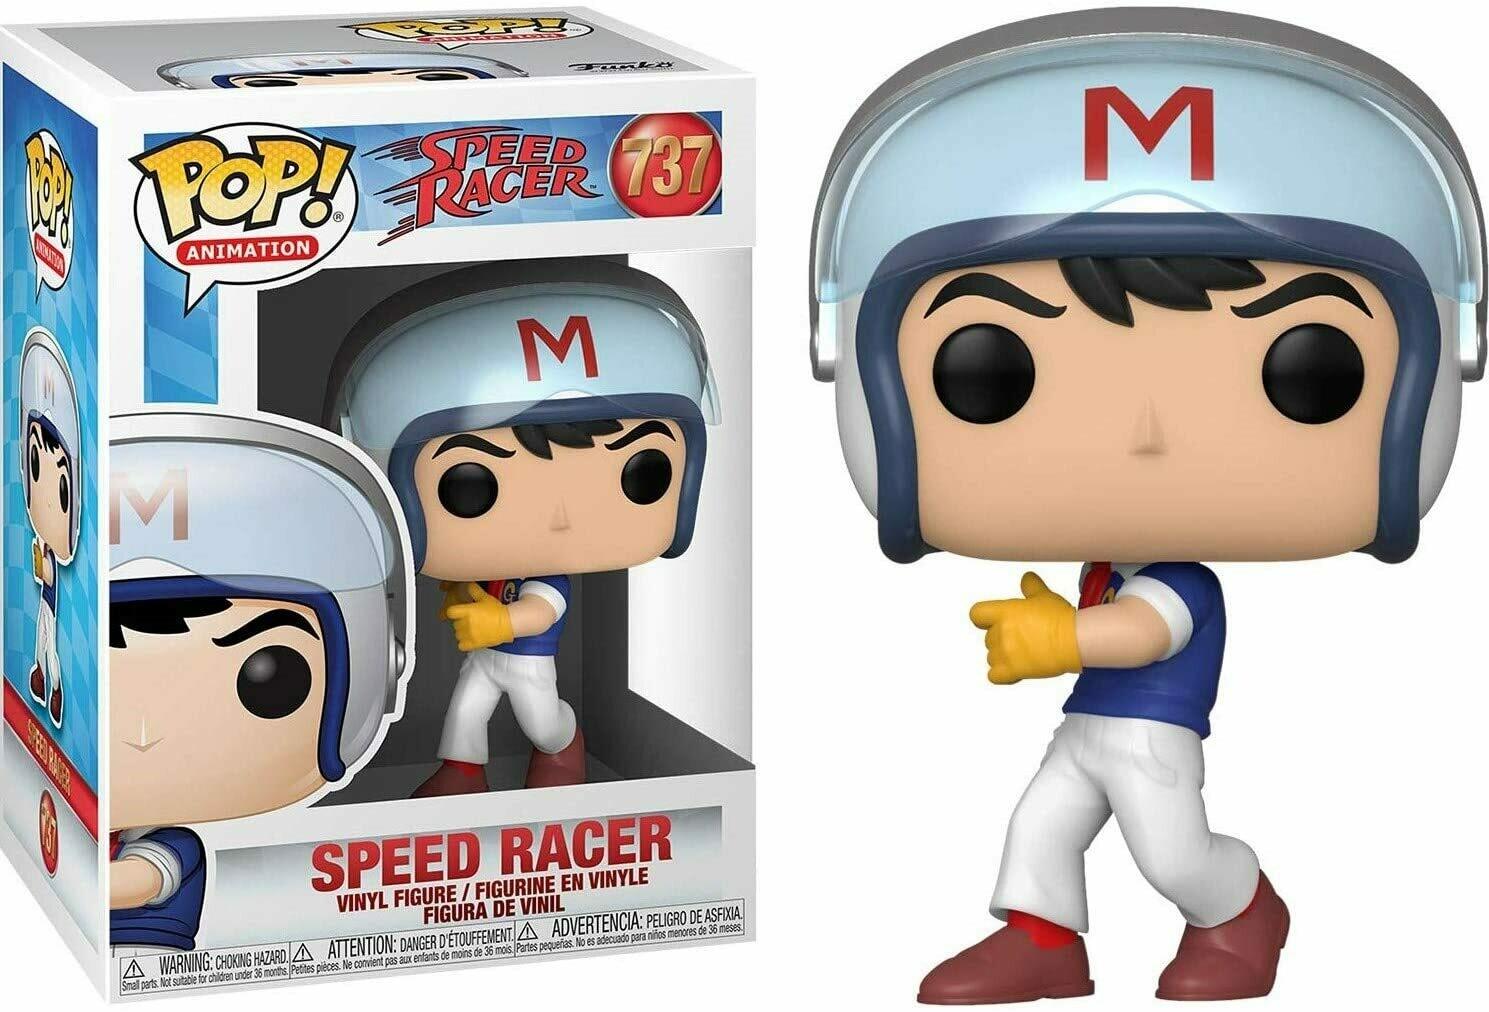 Funko Pop! Meteoro Speed Racer #737